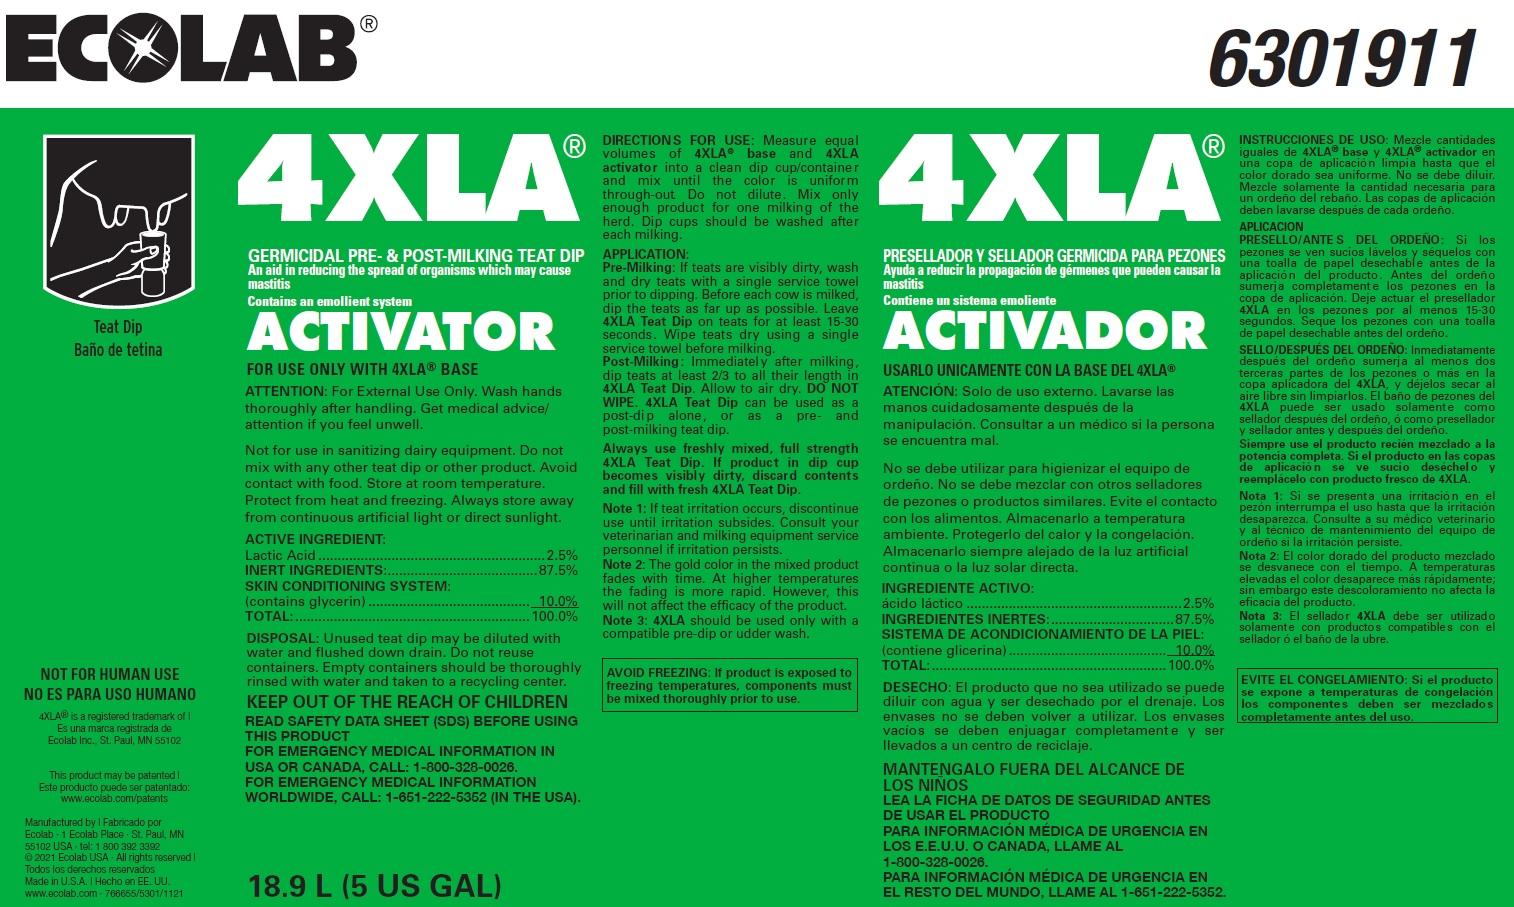 Occuloplex G (Euphrasia Officinalis, Ginkgo Biloba, Petroselinum Sativum, Spigelia Anthelmia, Vaccinium Myrtillus, Ascorbic Acidum, Eye) Liquid [Bioactive Nutritional, Inc.]